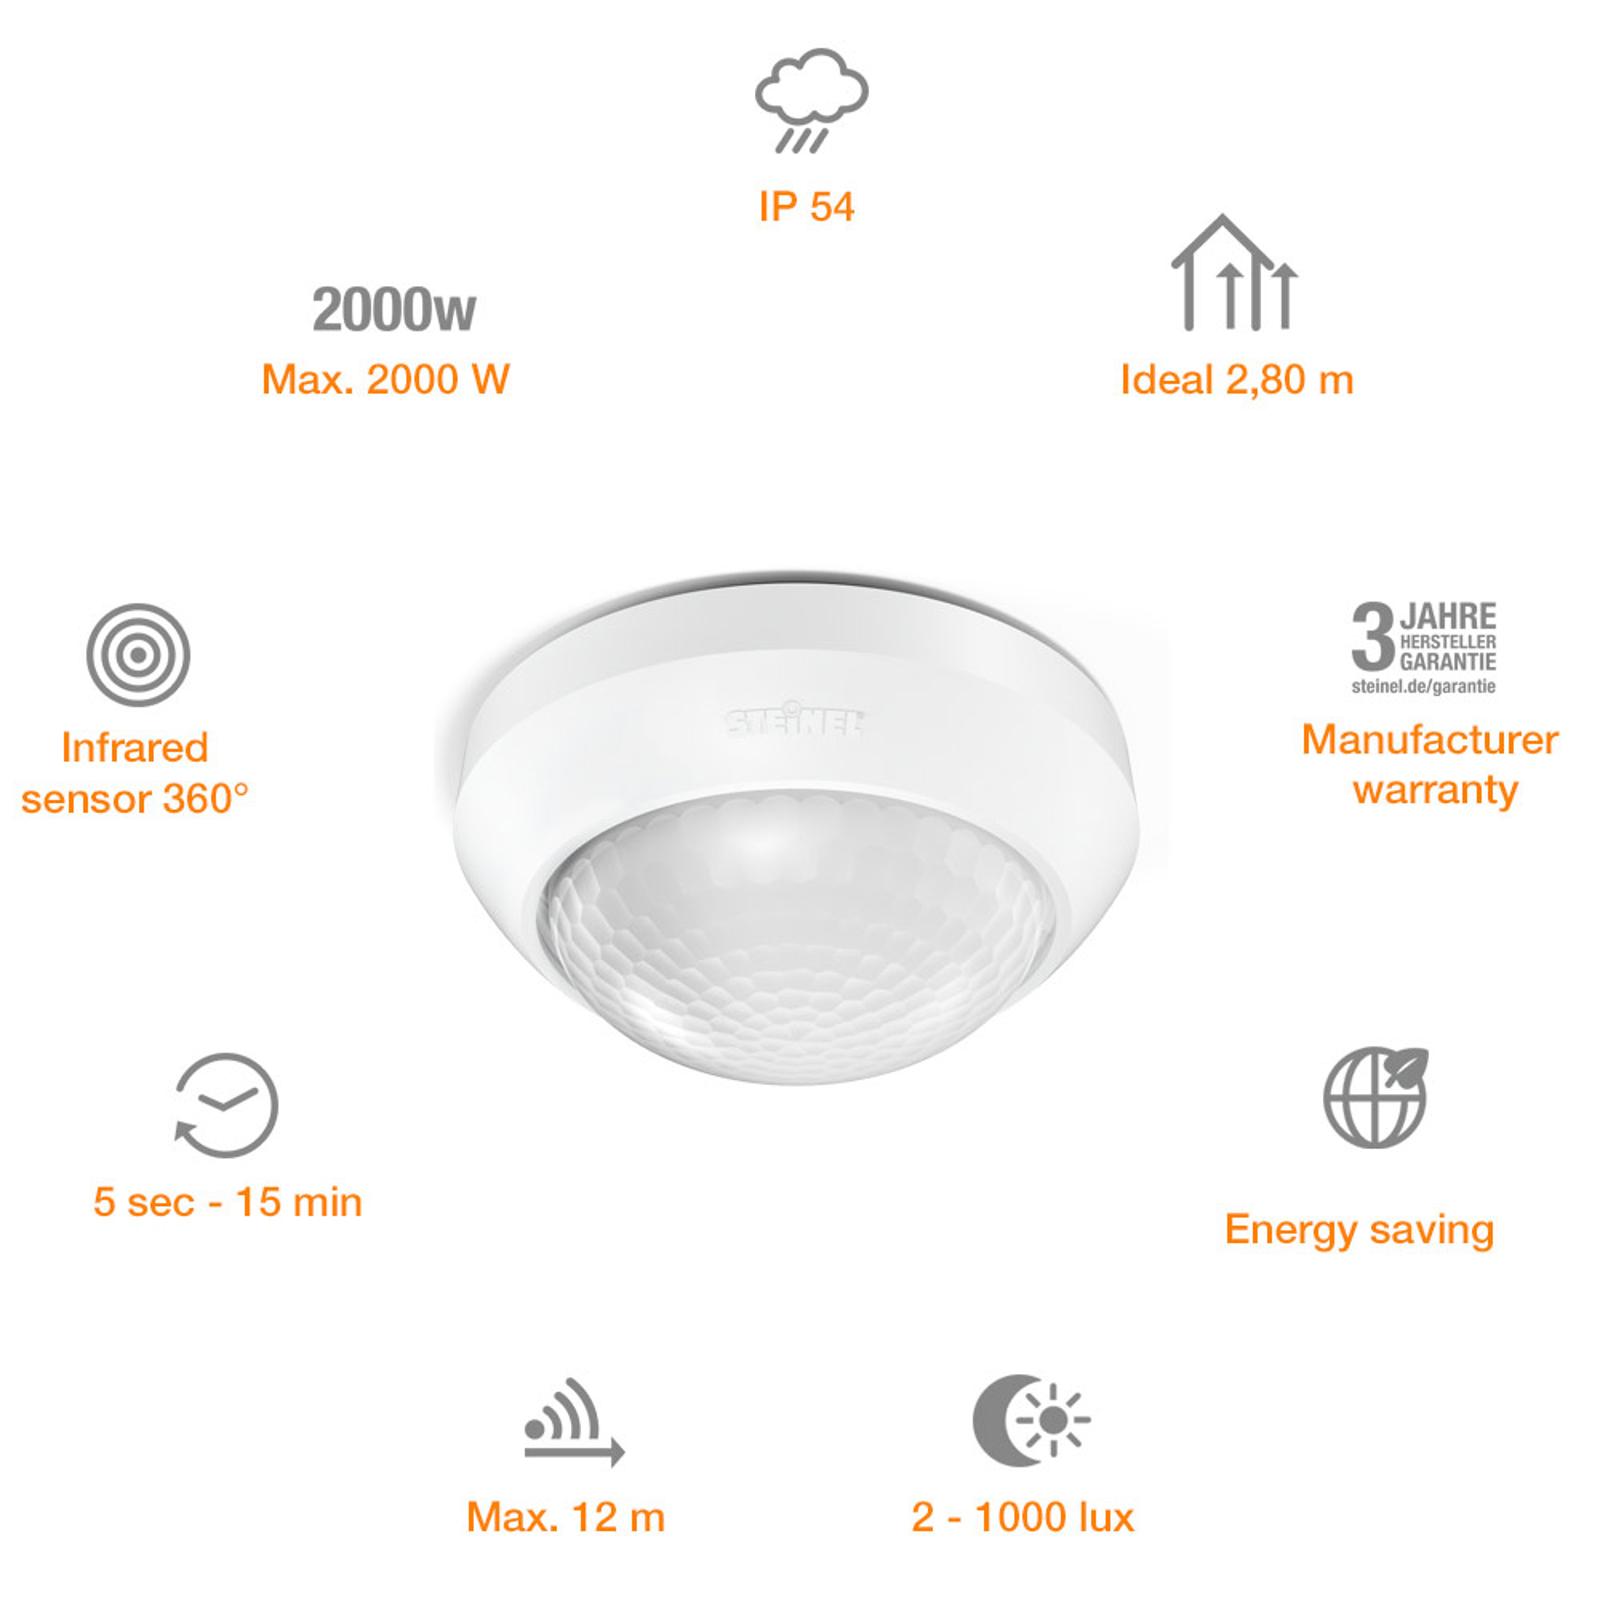 Steinel Is 360-1 240 V 1000 W de Potencia de conmutaci/ón 1000 W Plateado Apto para LED Detector de Movimiento m/áx Alcance de 4 m Sensor de 360/° 034917 1000W 240V